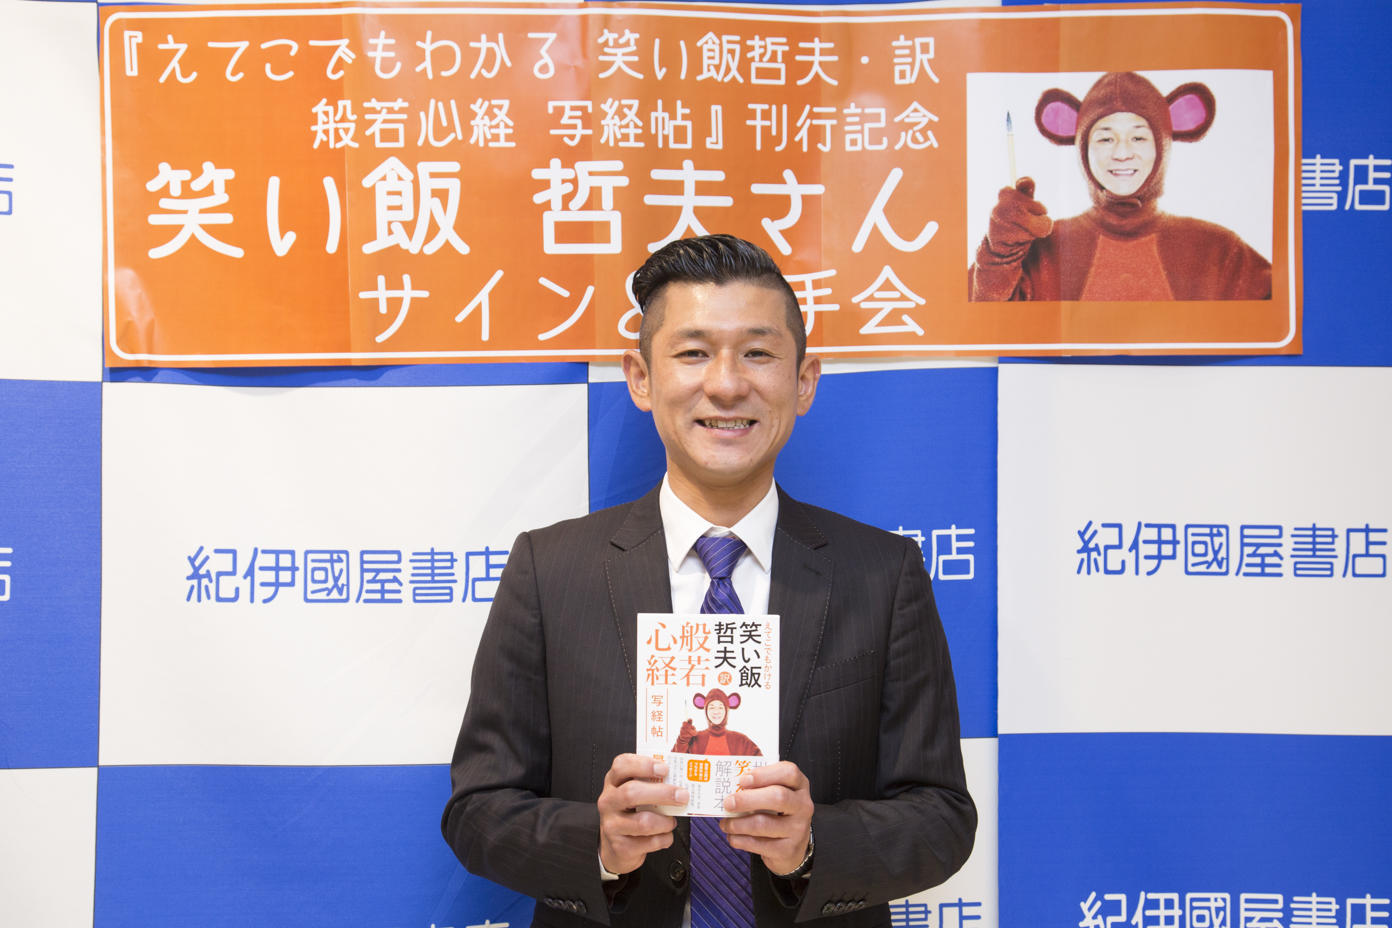 http://news.yoshimoto.co.jp/20170601102439-157248fc731b08cb1b1f17e280b54d836989af75.jpg